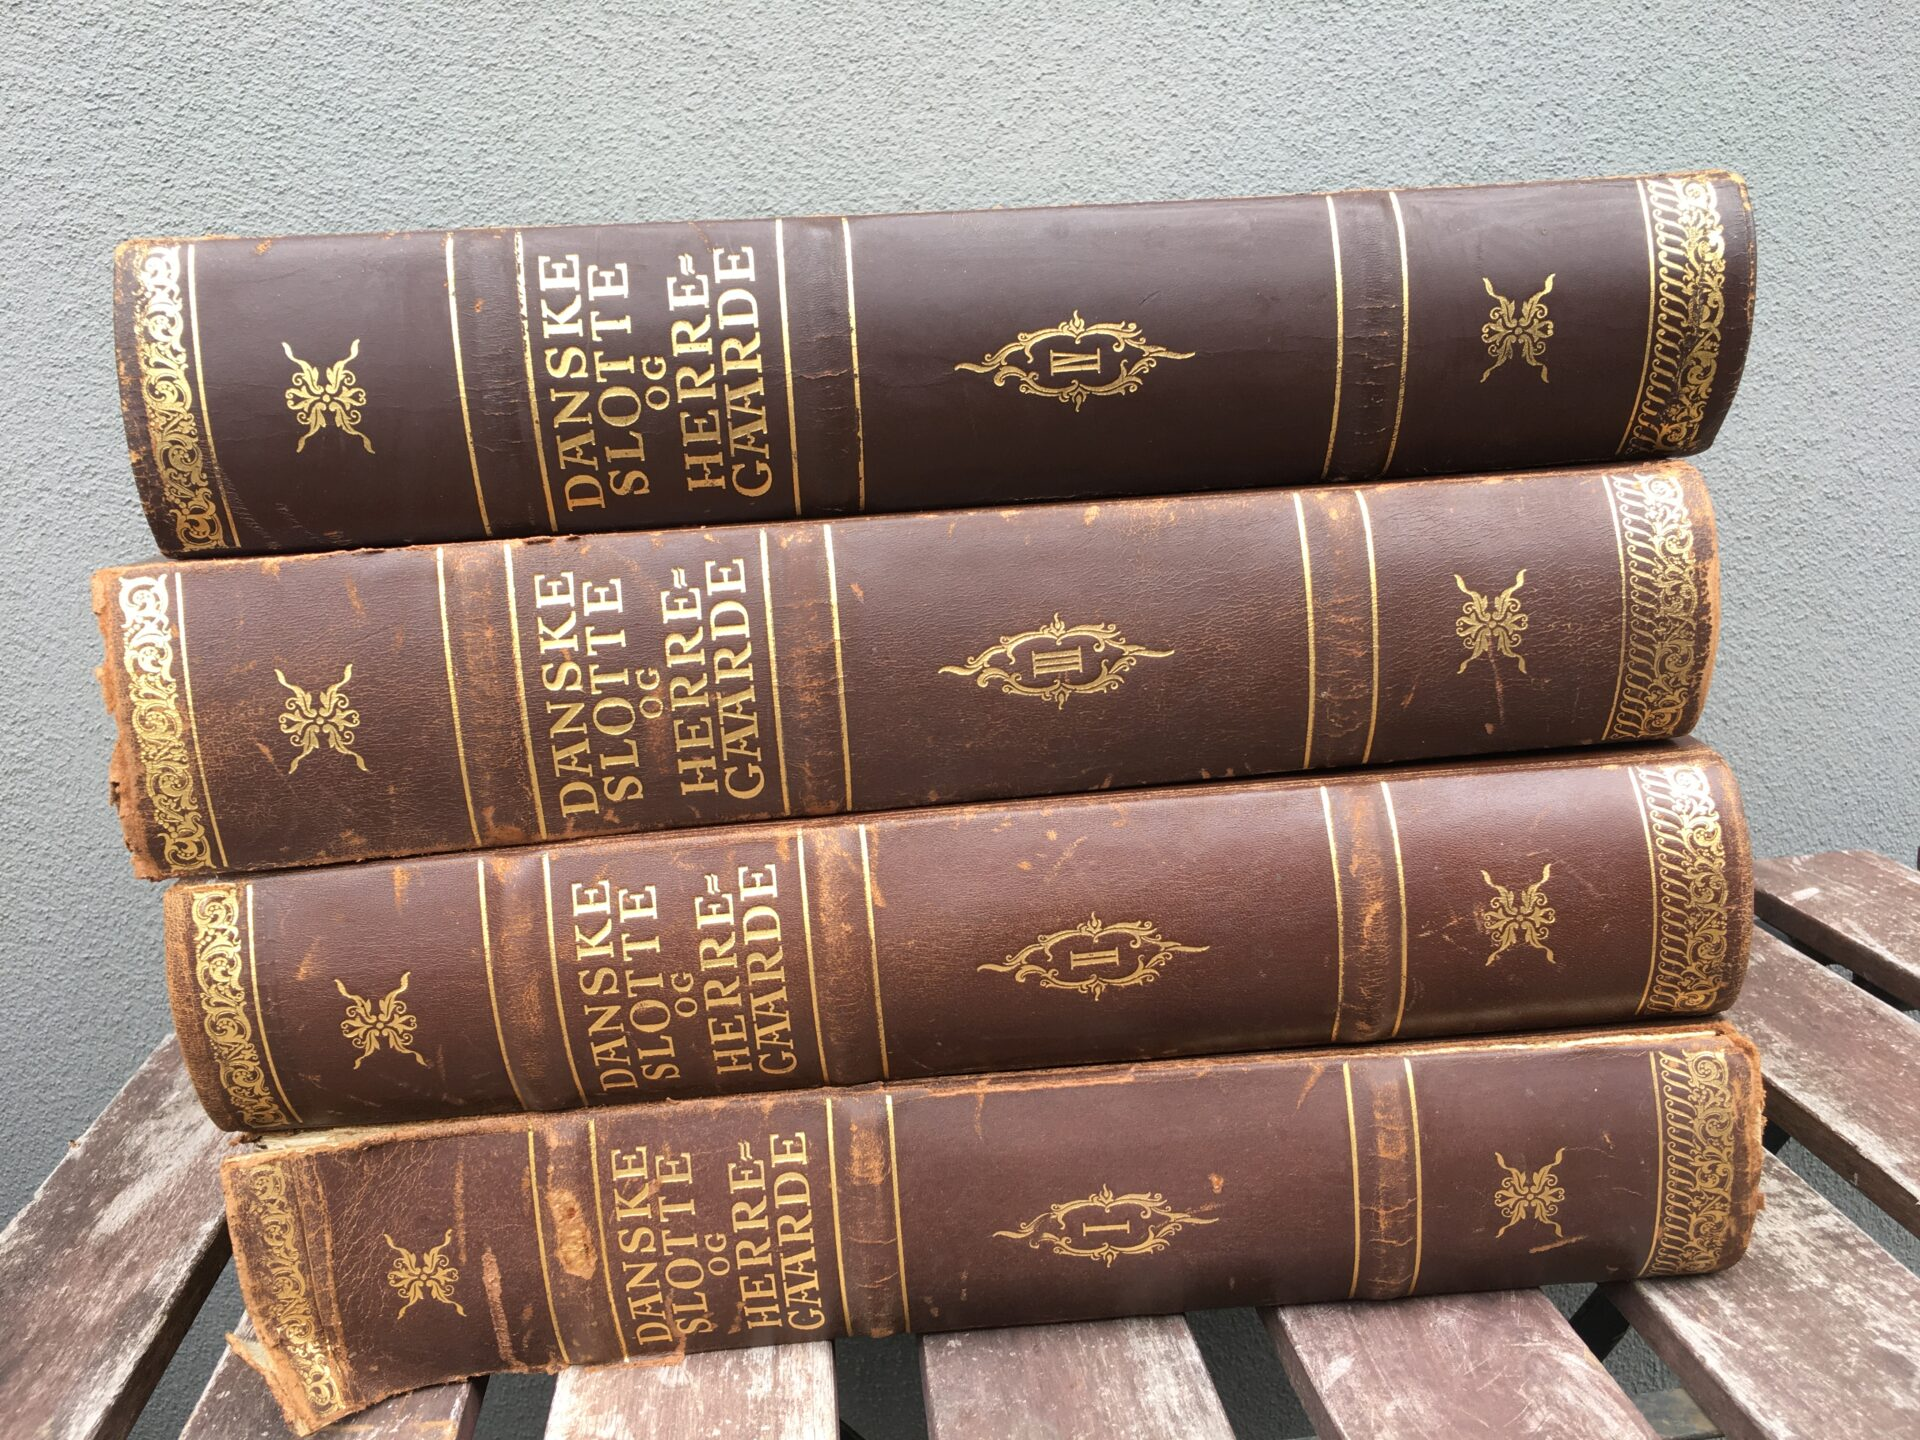 Danske slotte og herregårde, 4 bd, årg. 1944, Hassings forlag. Pris i alt 400kr